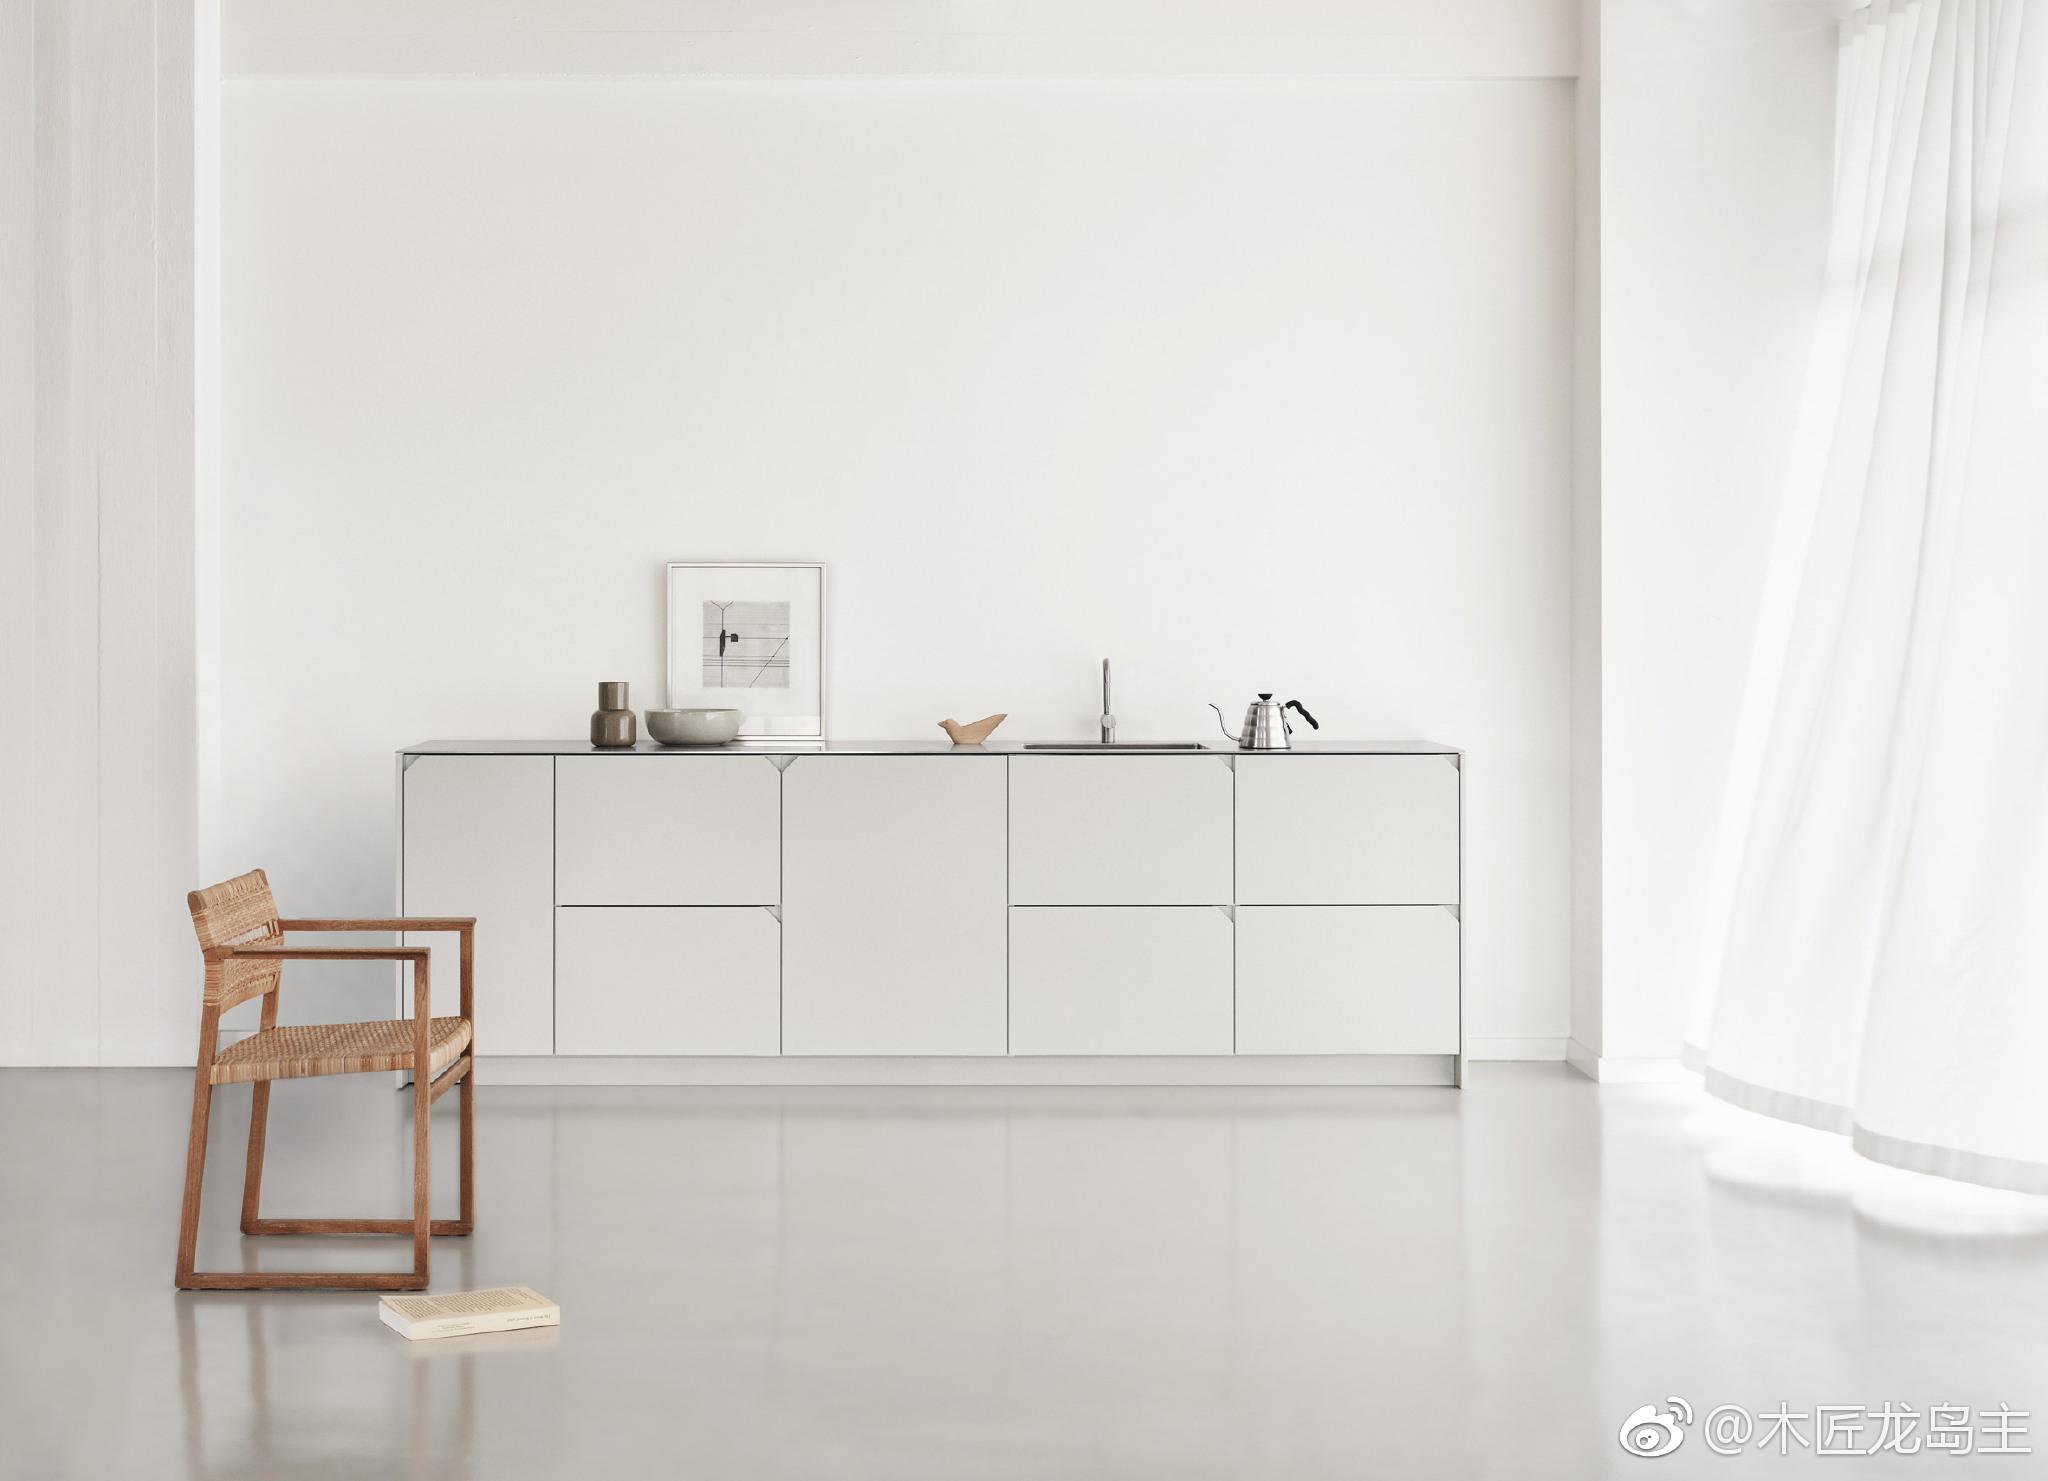 ikea kitchen cabinet handles polished brass faucet cecilie manz将松木板材定位成45度角 以匹配宜家厨房的切割门把手 松木 这是为丹麦品牌改革定制的 manz是一系列知名设计师中最新的一个 他们为哥本哈根的改革设计了一个专门定制宜家 metod厨柜的厨房